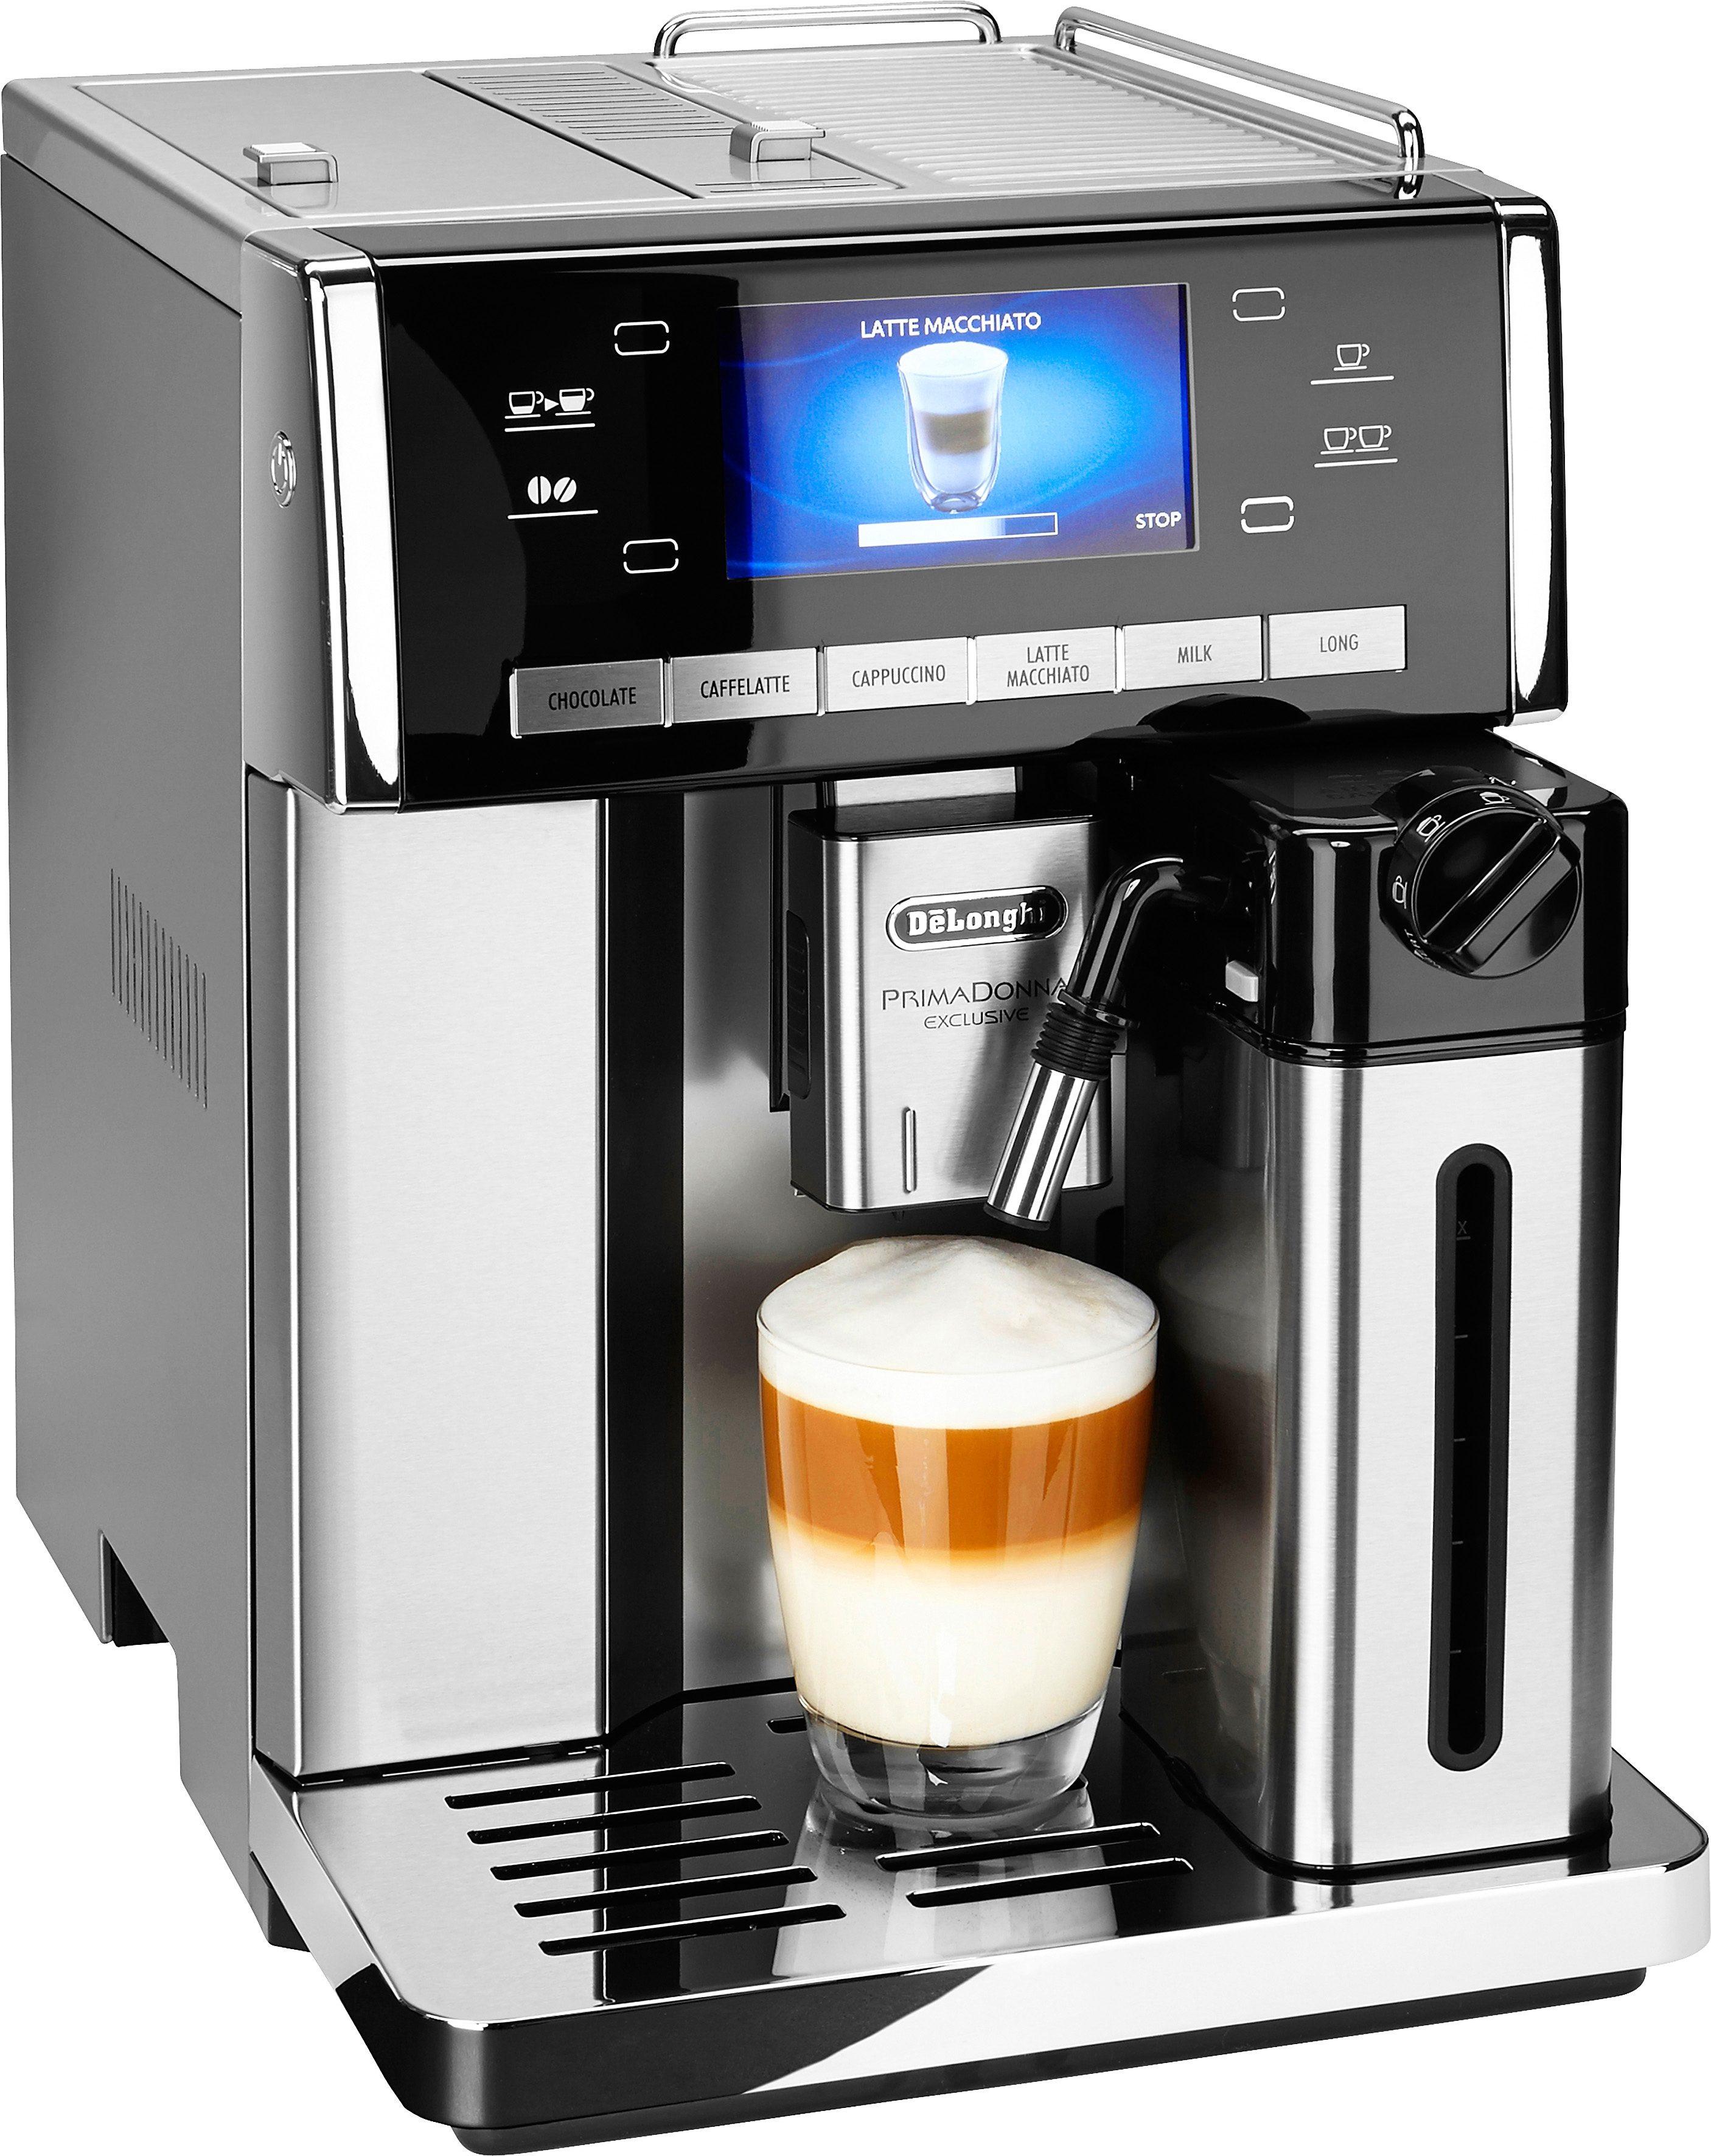 DELONGHI Kaffeevollautomat PrimaDonna Exclusive ESAM 6900.M, 1,4l Tank, Kegelmahlwerk, Trinkschokolade auf Knopfdruck